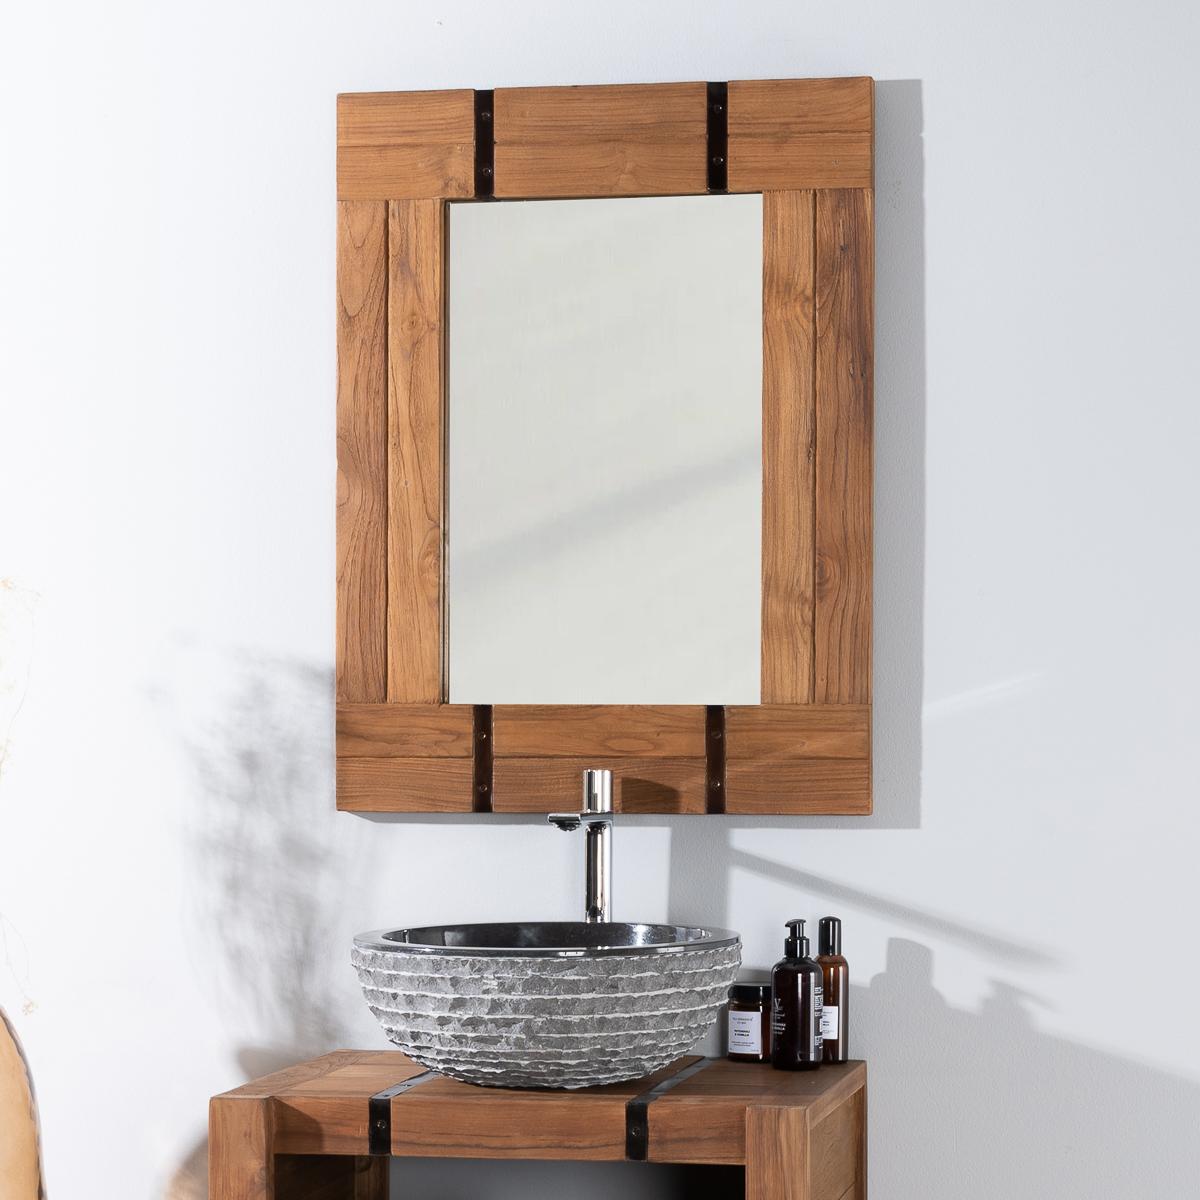 Miroir de salle de bain naturel loft 60x80 naturel for Miroir des limbes